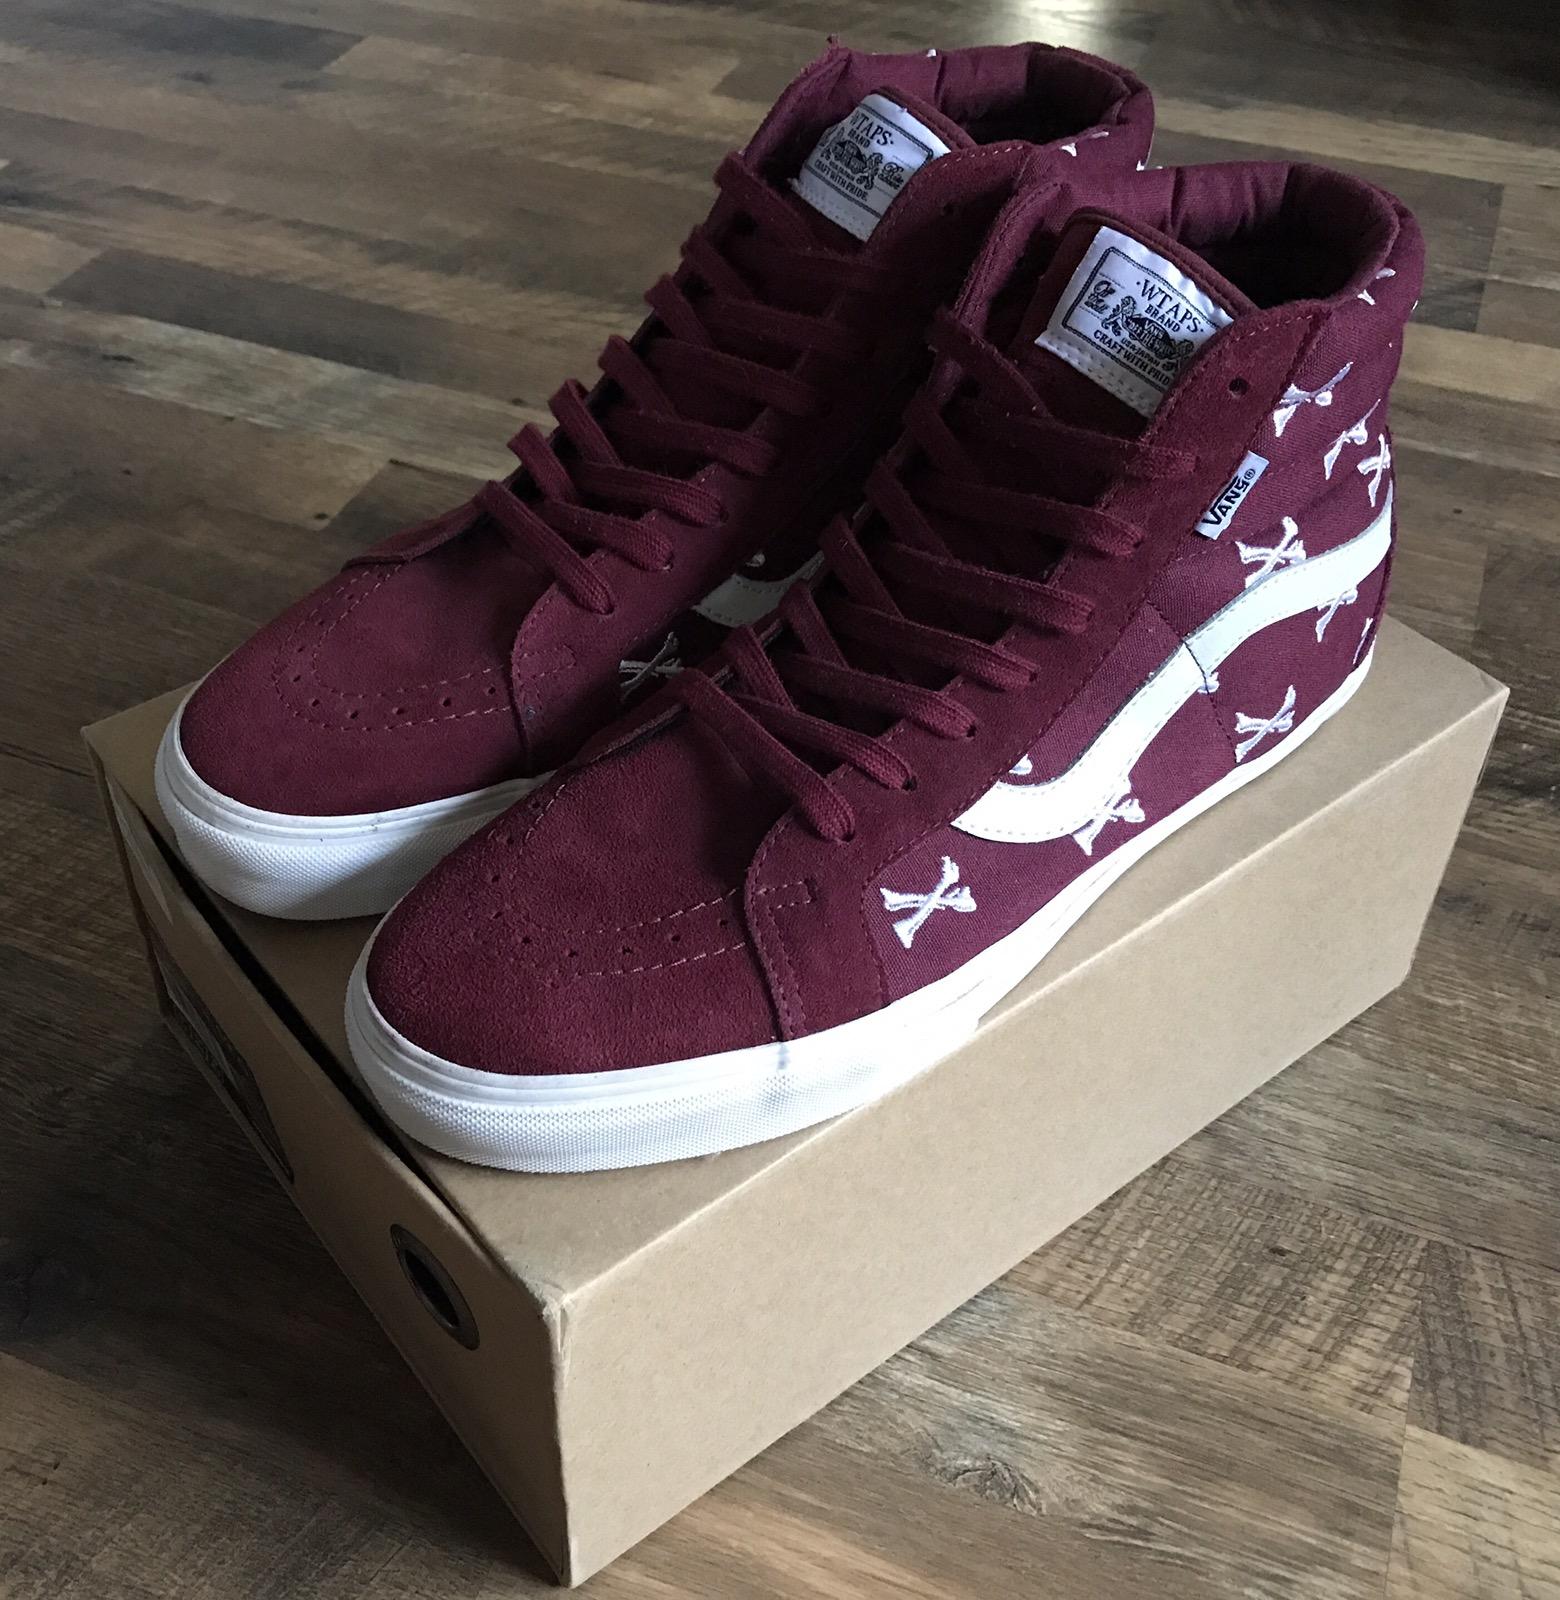 e11c962097 Vans Vans Syndicate x Wtaps Bones Sk8-hi Burgundy Size 12 - Hi-Top Sneakers  for Sale - Grailed